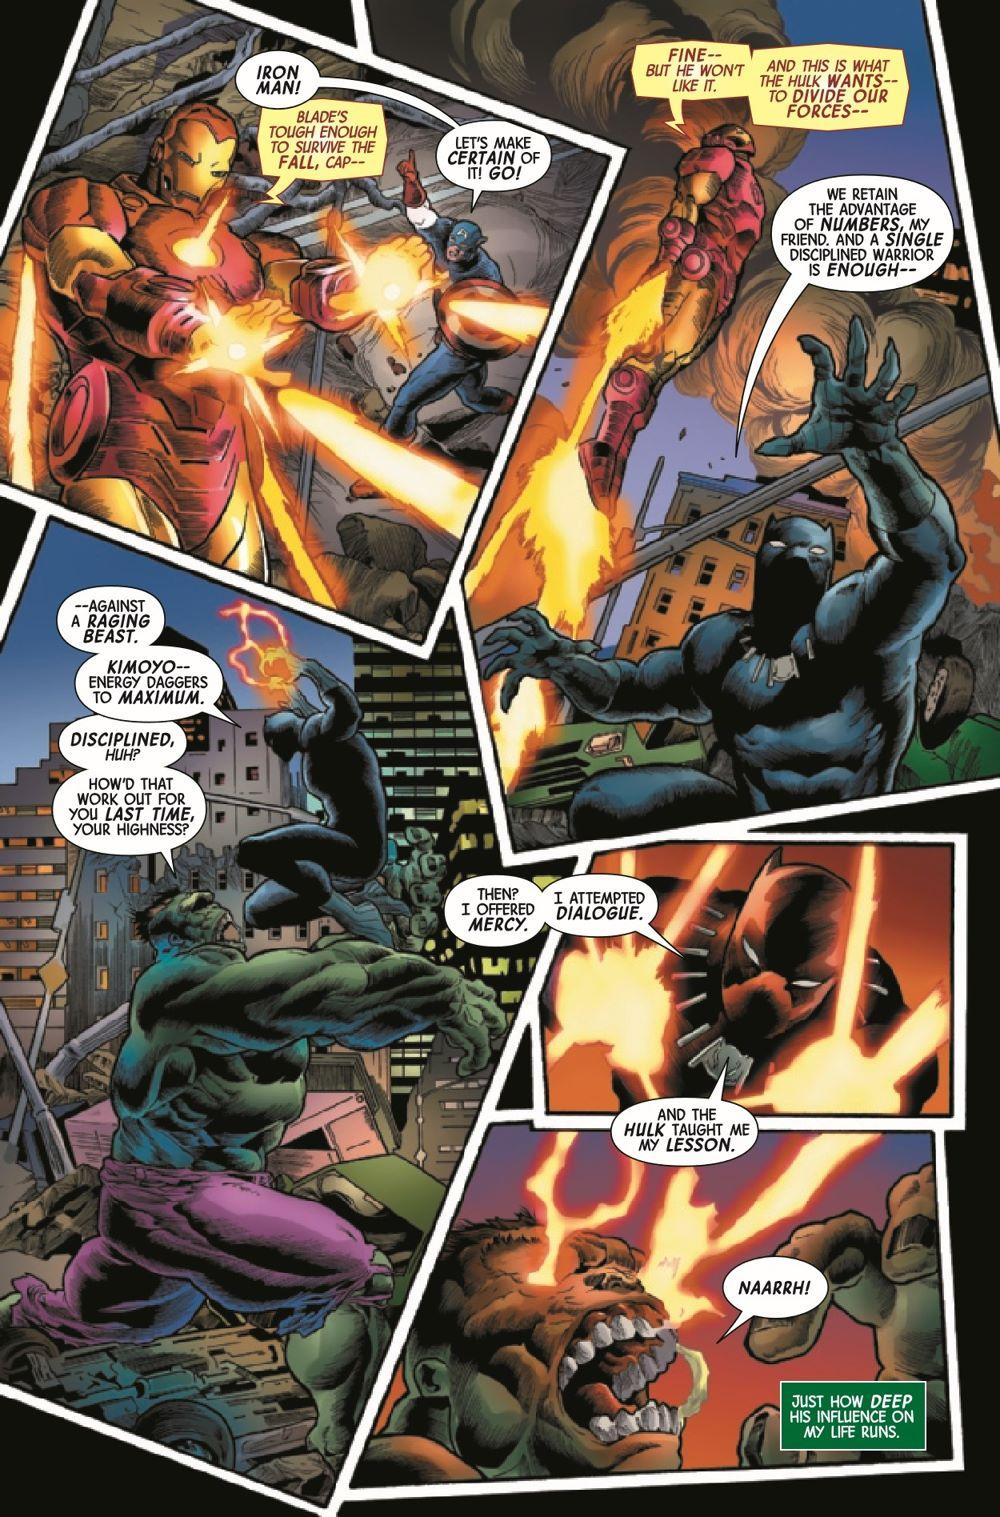 HULK2018047_Preview-5 ComicList Previews: THE IMMORTAL HULK #47